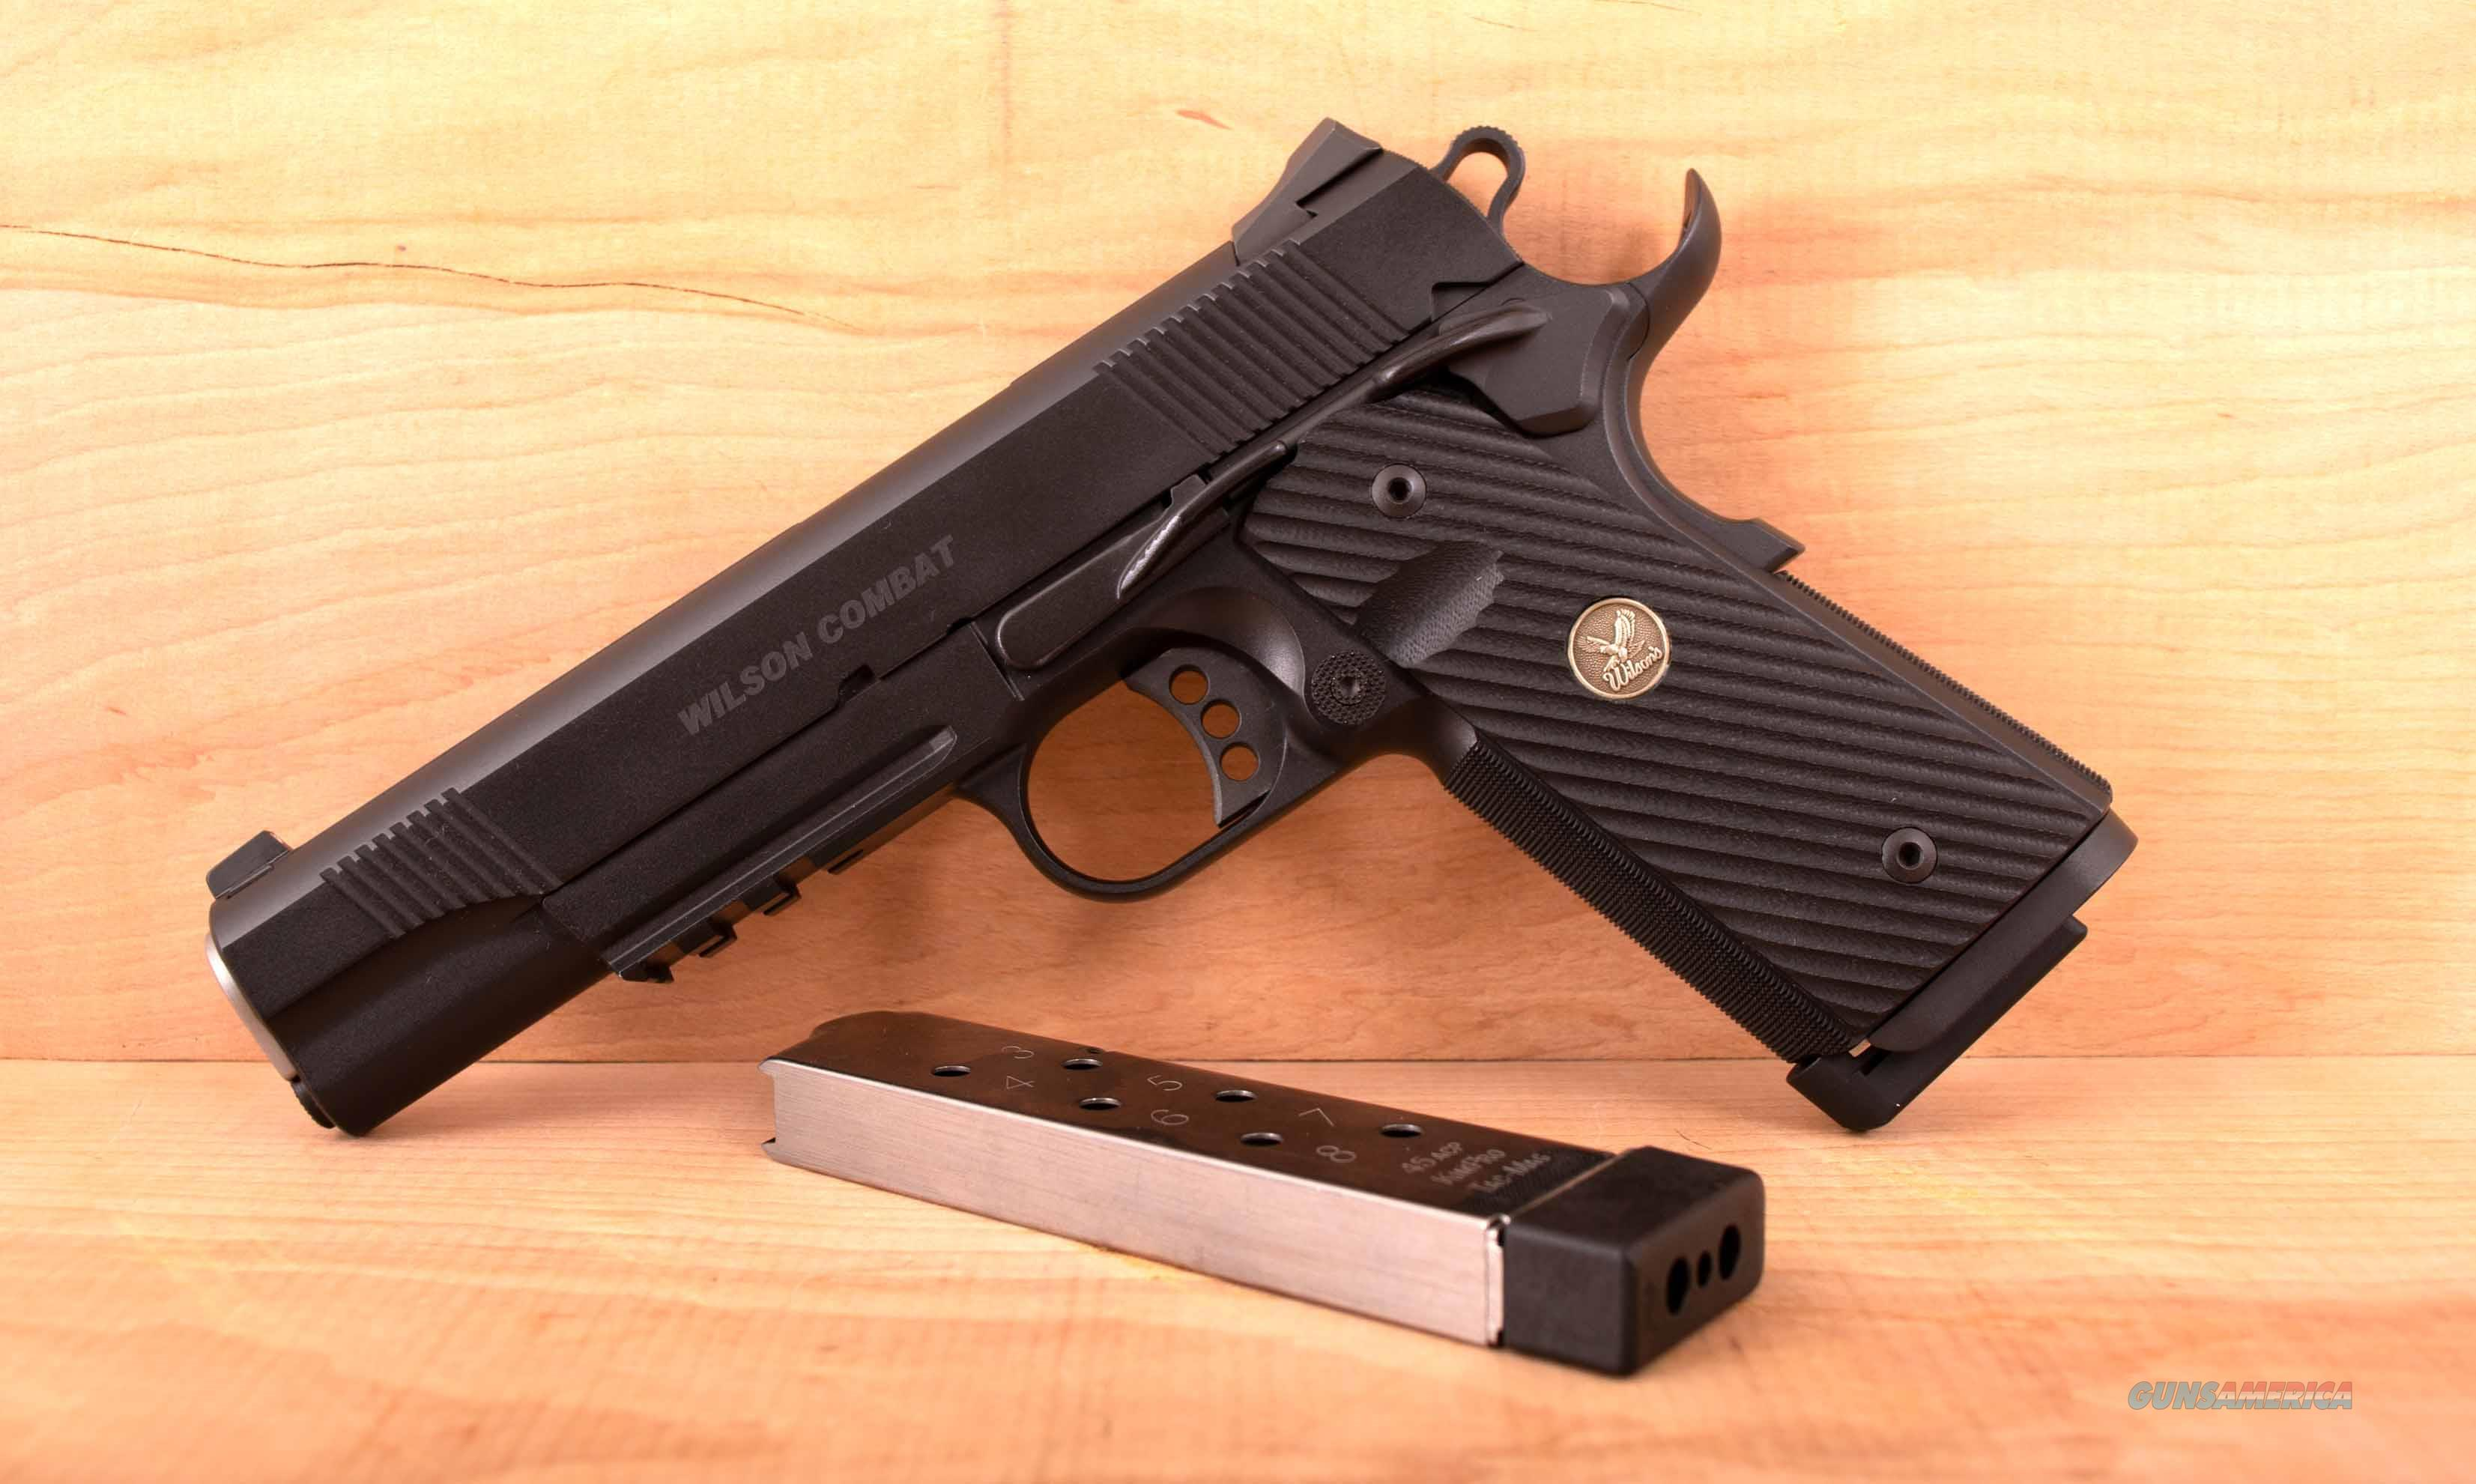 Wilson Combat CQB Elite .45acp – CUSTOM ORDER wilson combat, vintage firearms inc   Guns > Pistols > Wilson Combat Pistols